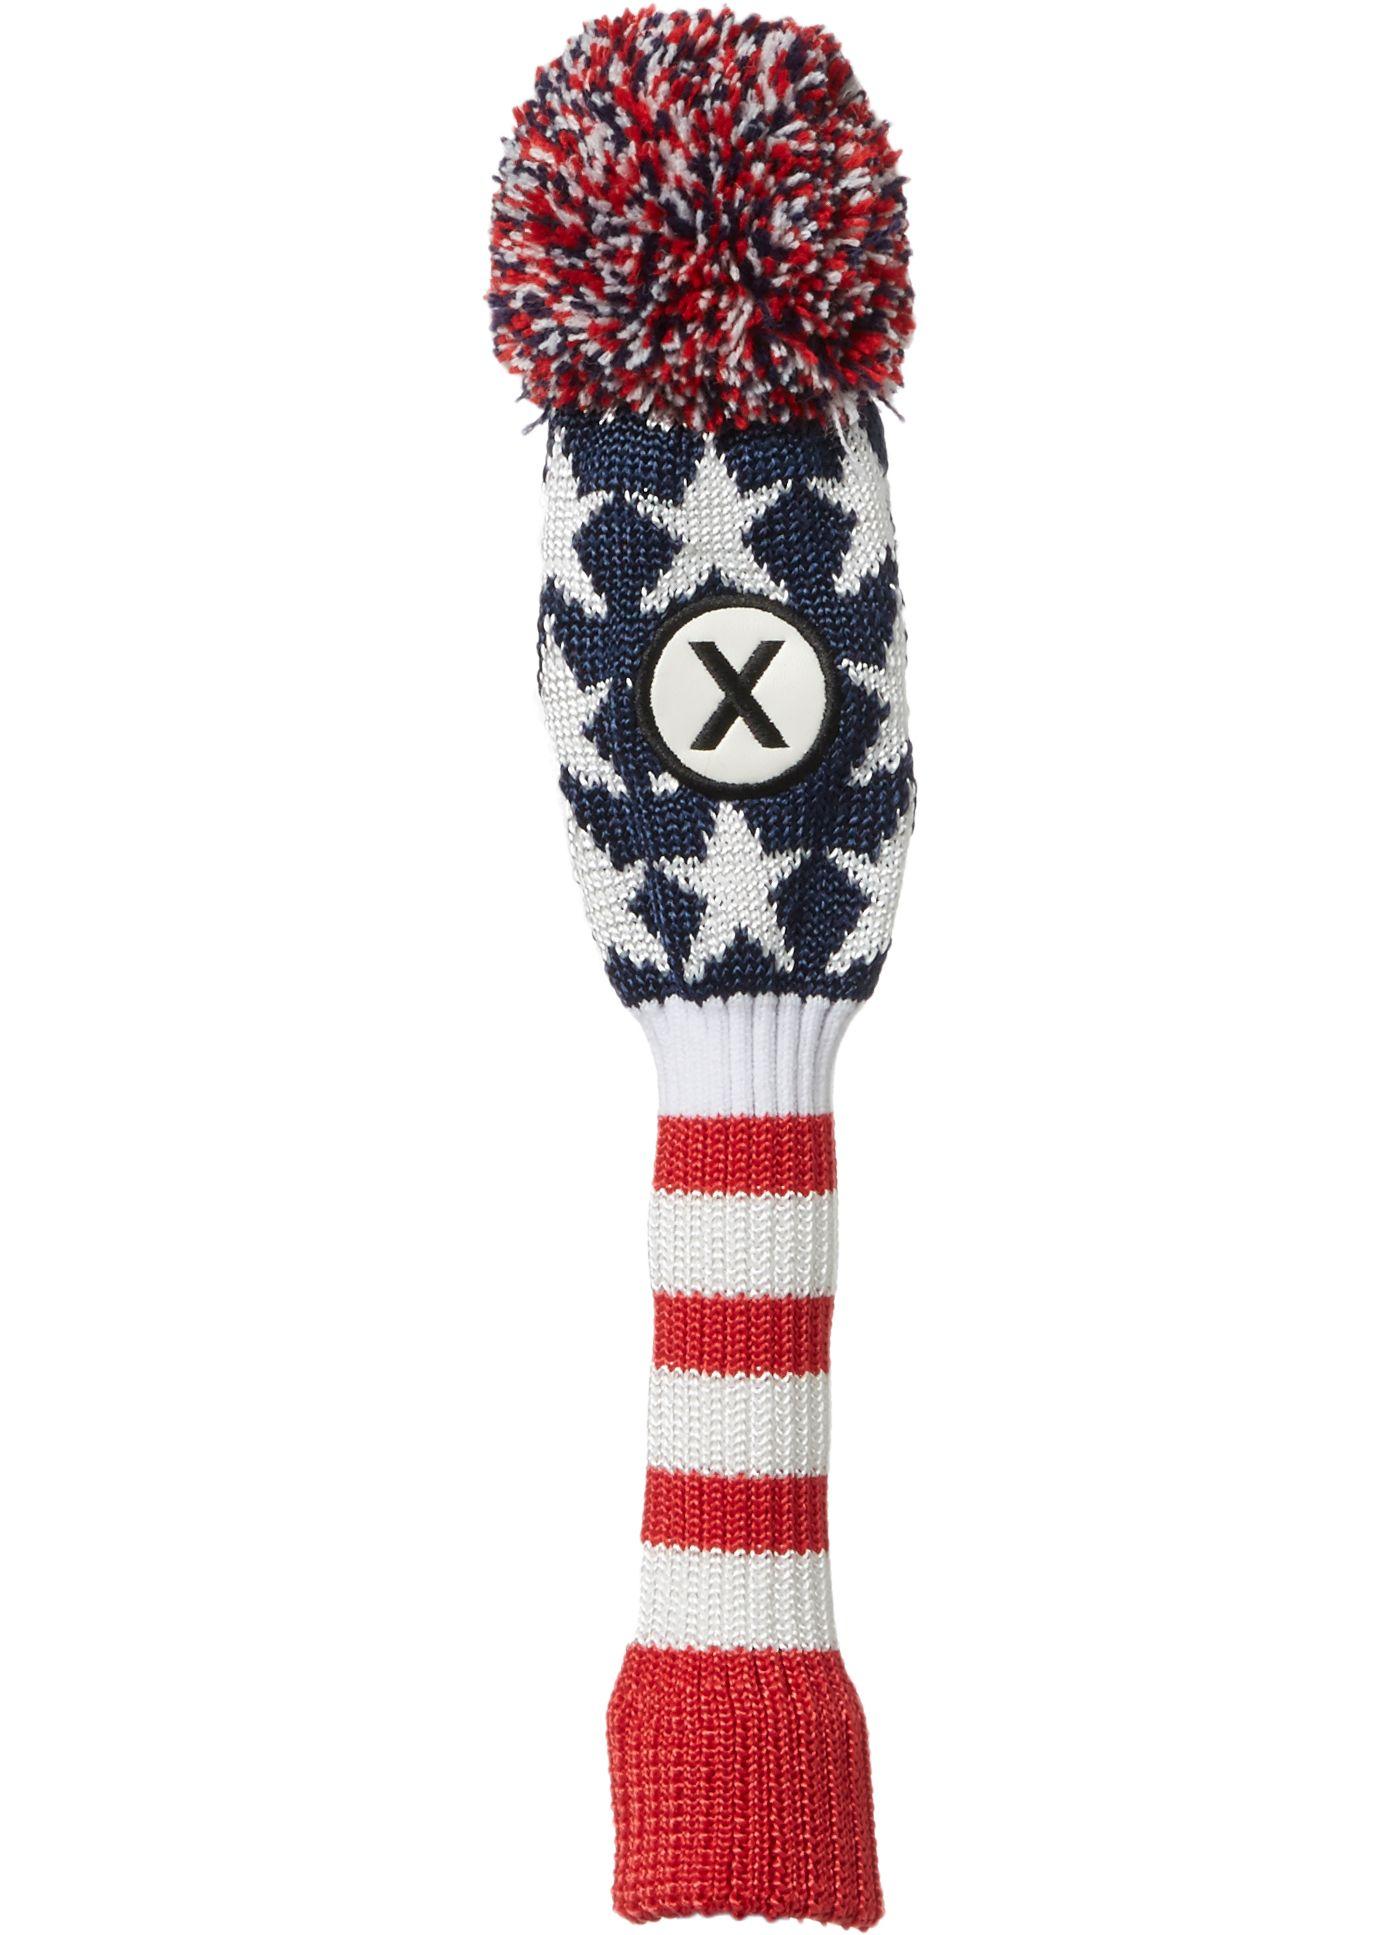 Maxfli Vintage Knit Hybrid Headcover